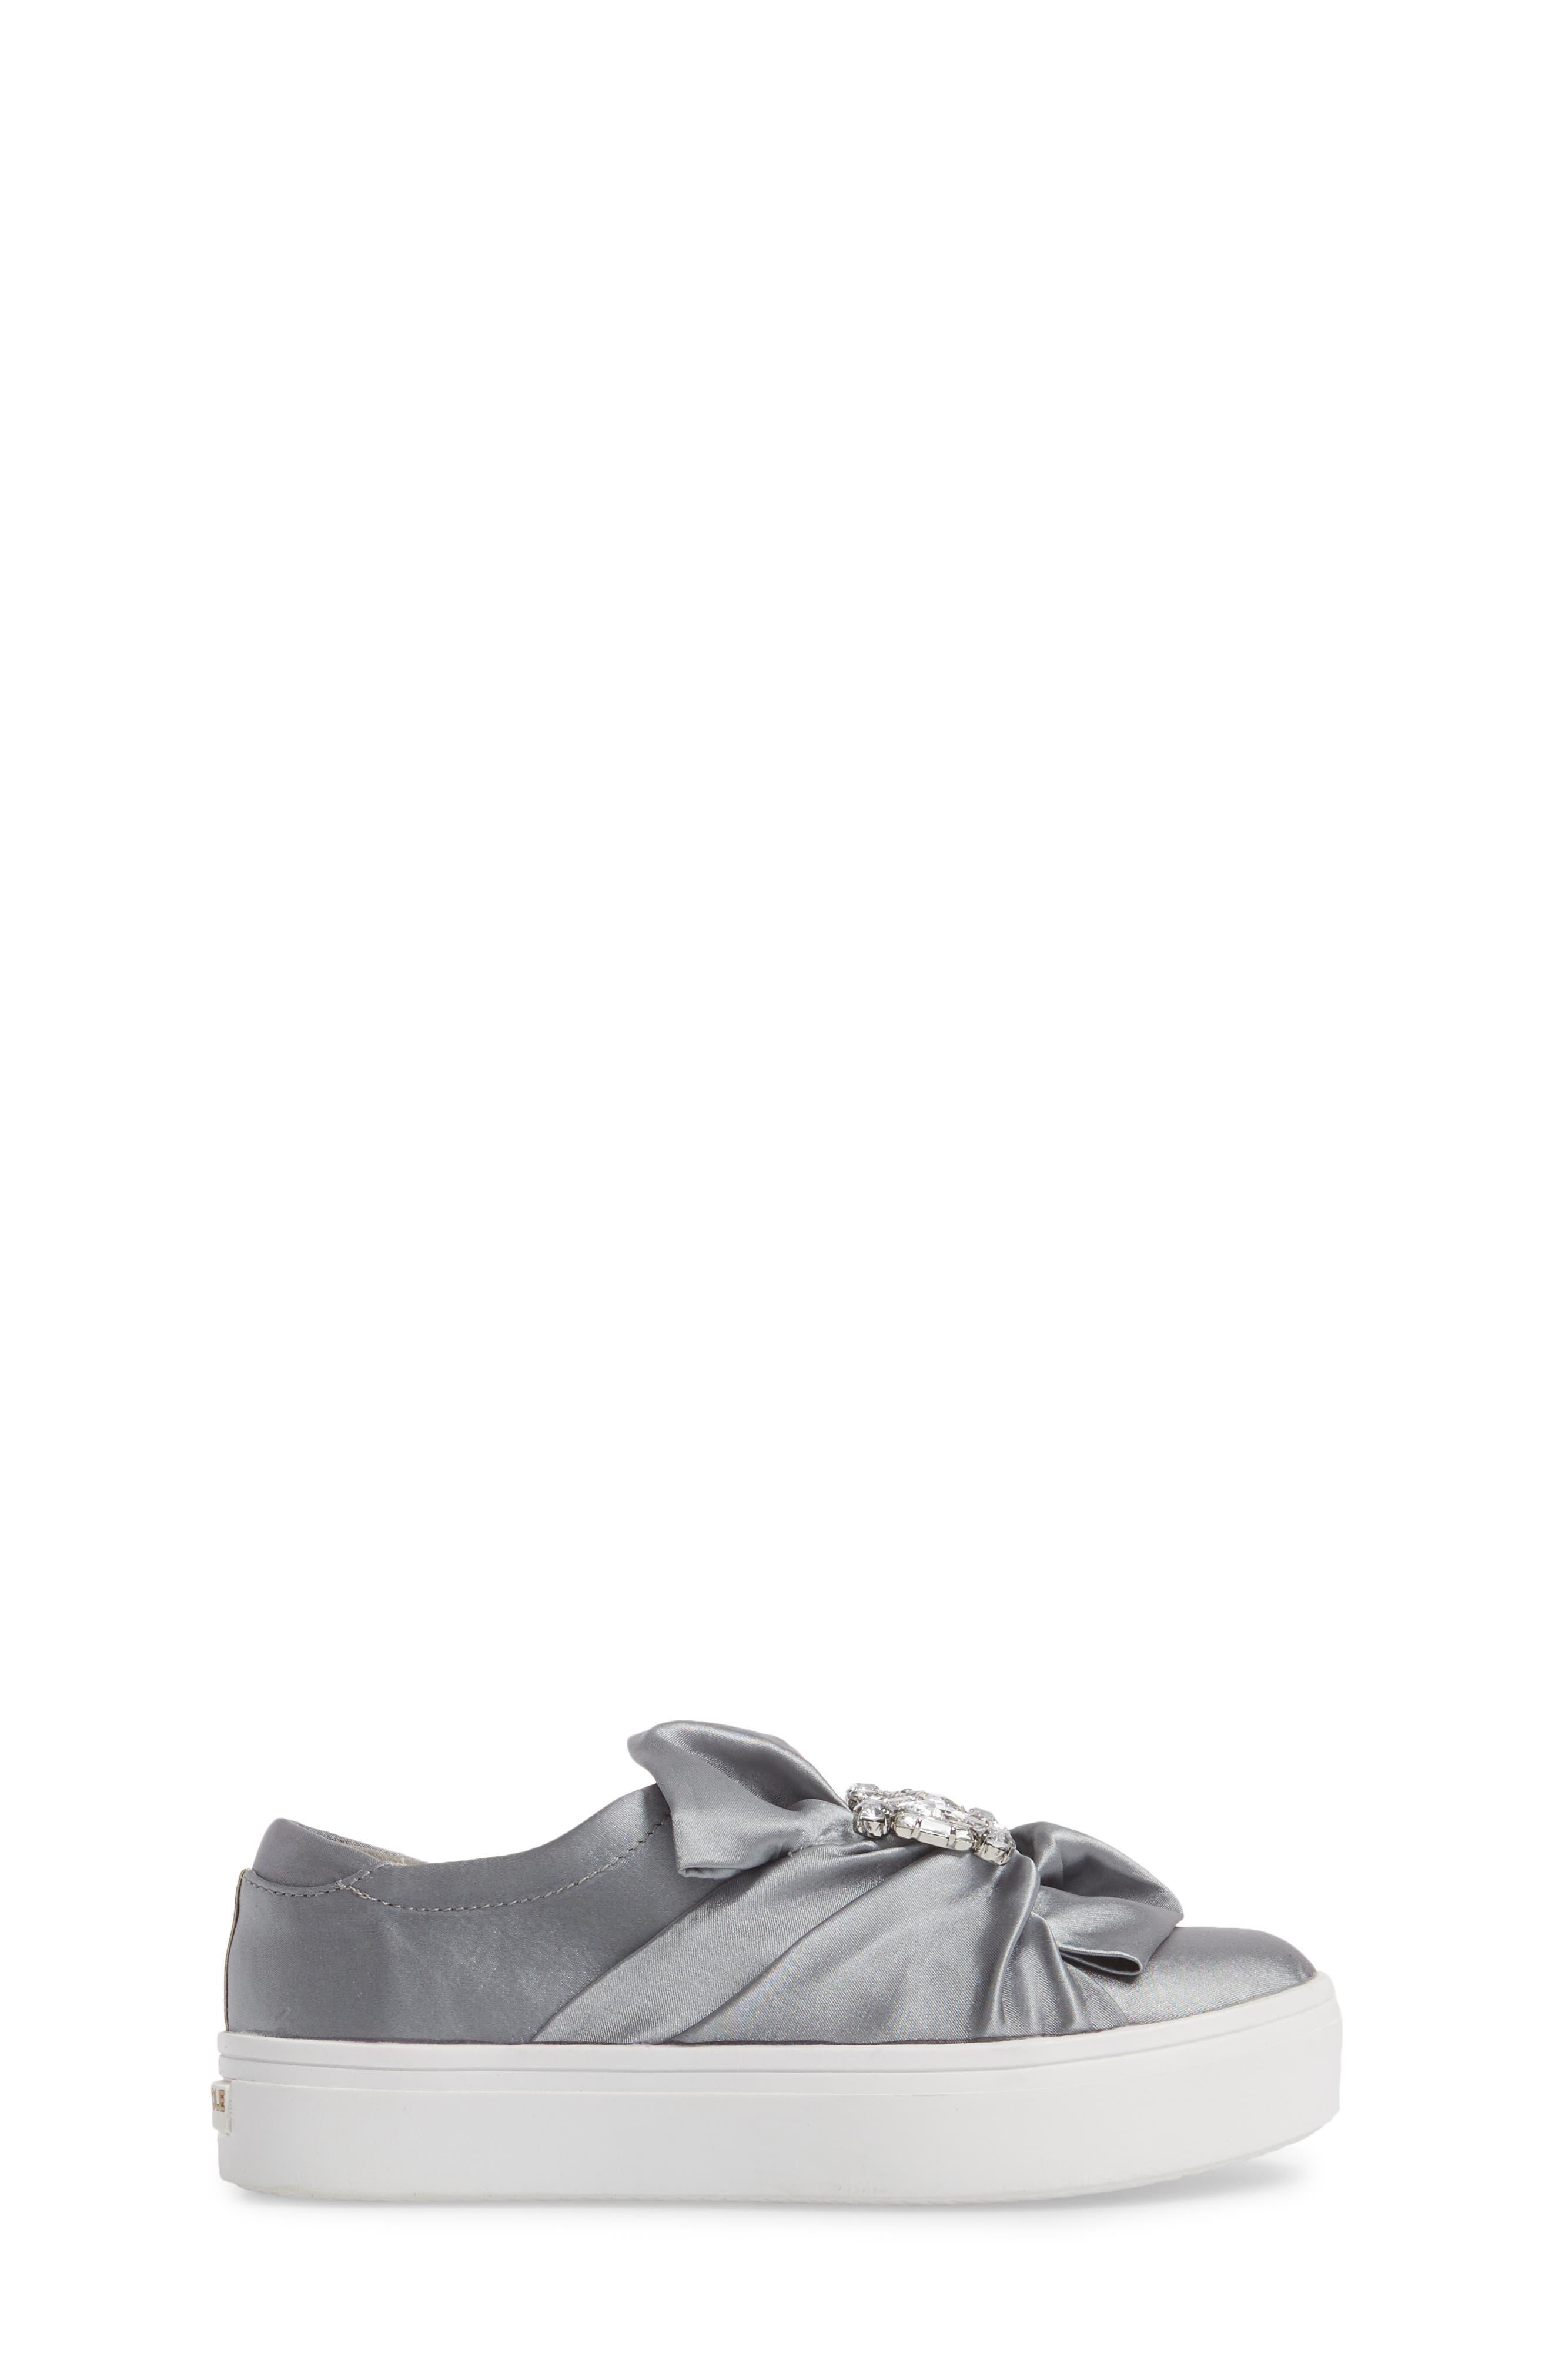 Shout Shine Embellished Sneaker,                             Alternate thumbnail 3, color,                             Gray